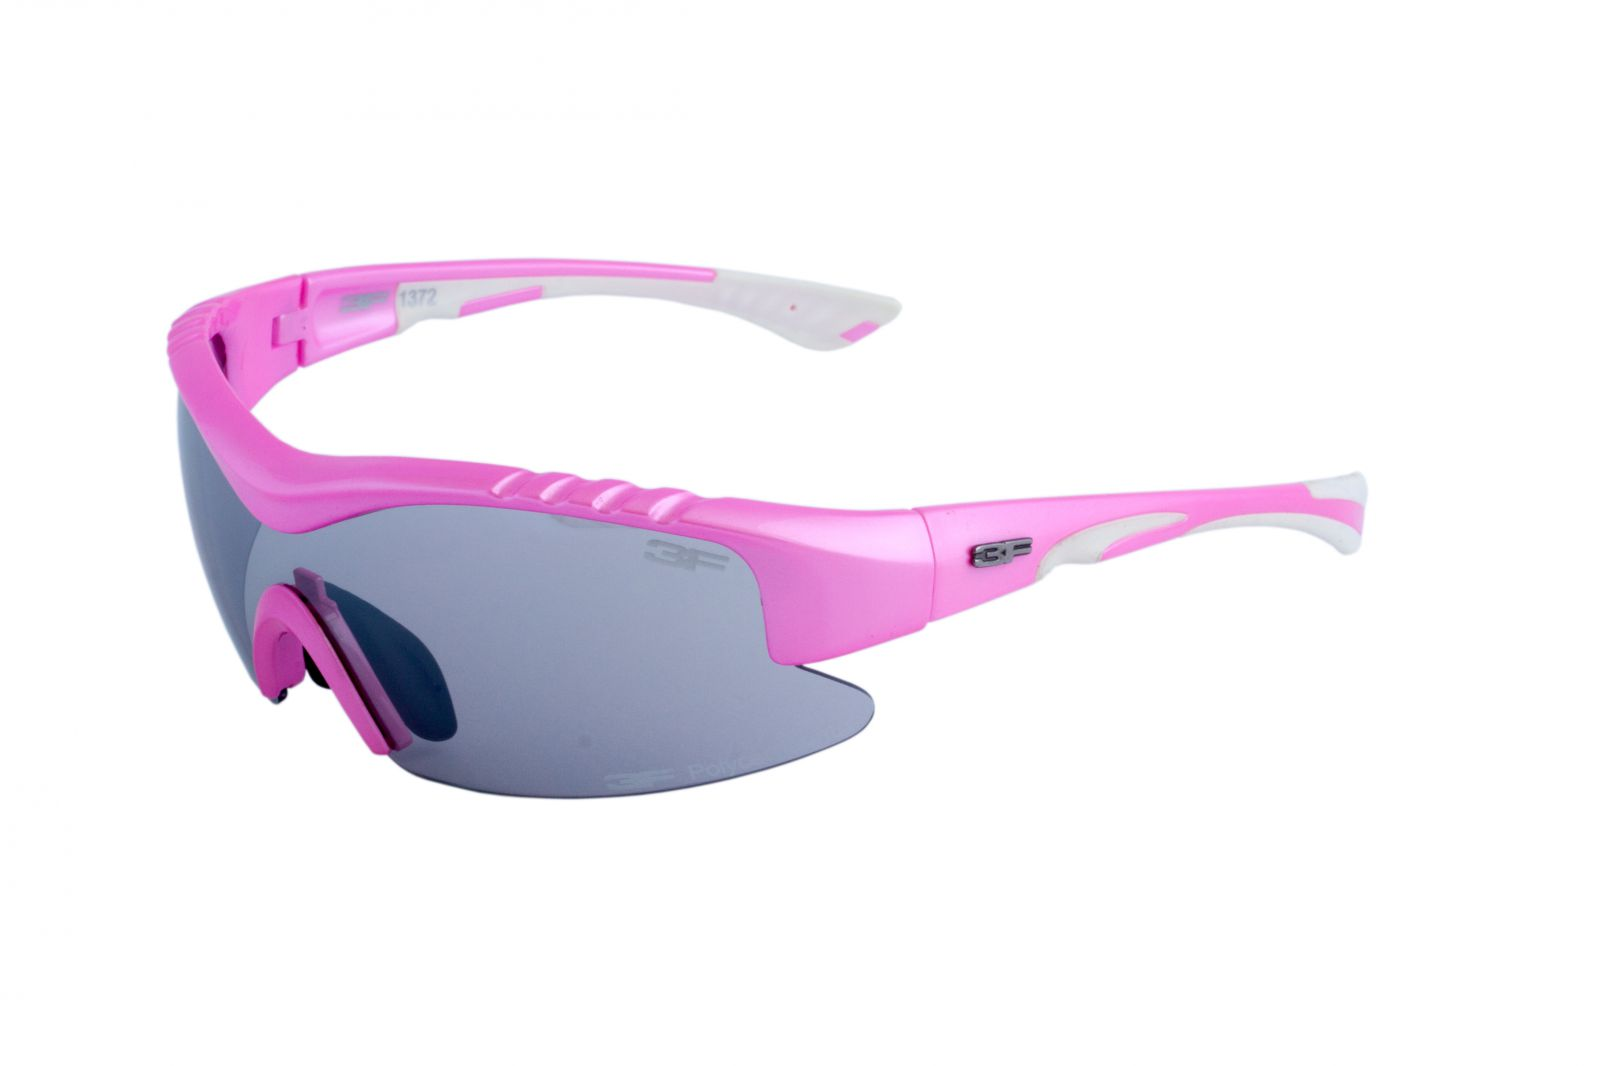 Cyklistické brýle 3F Fire 1372